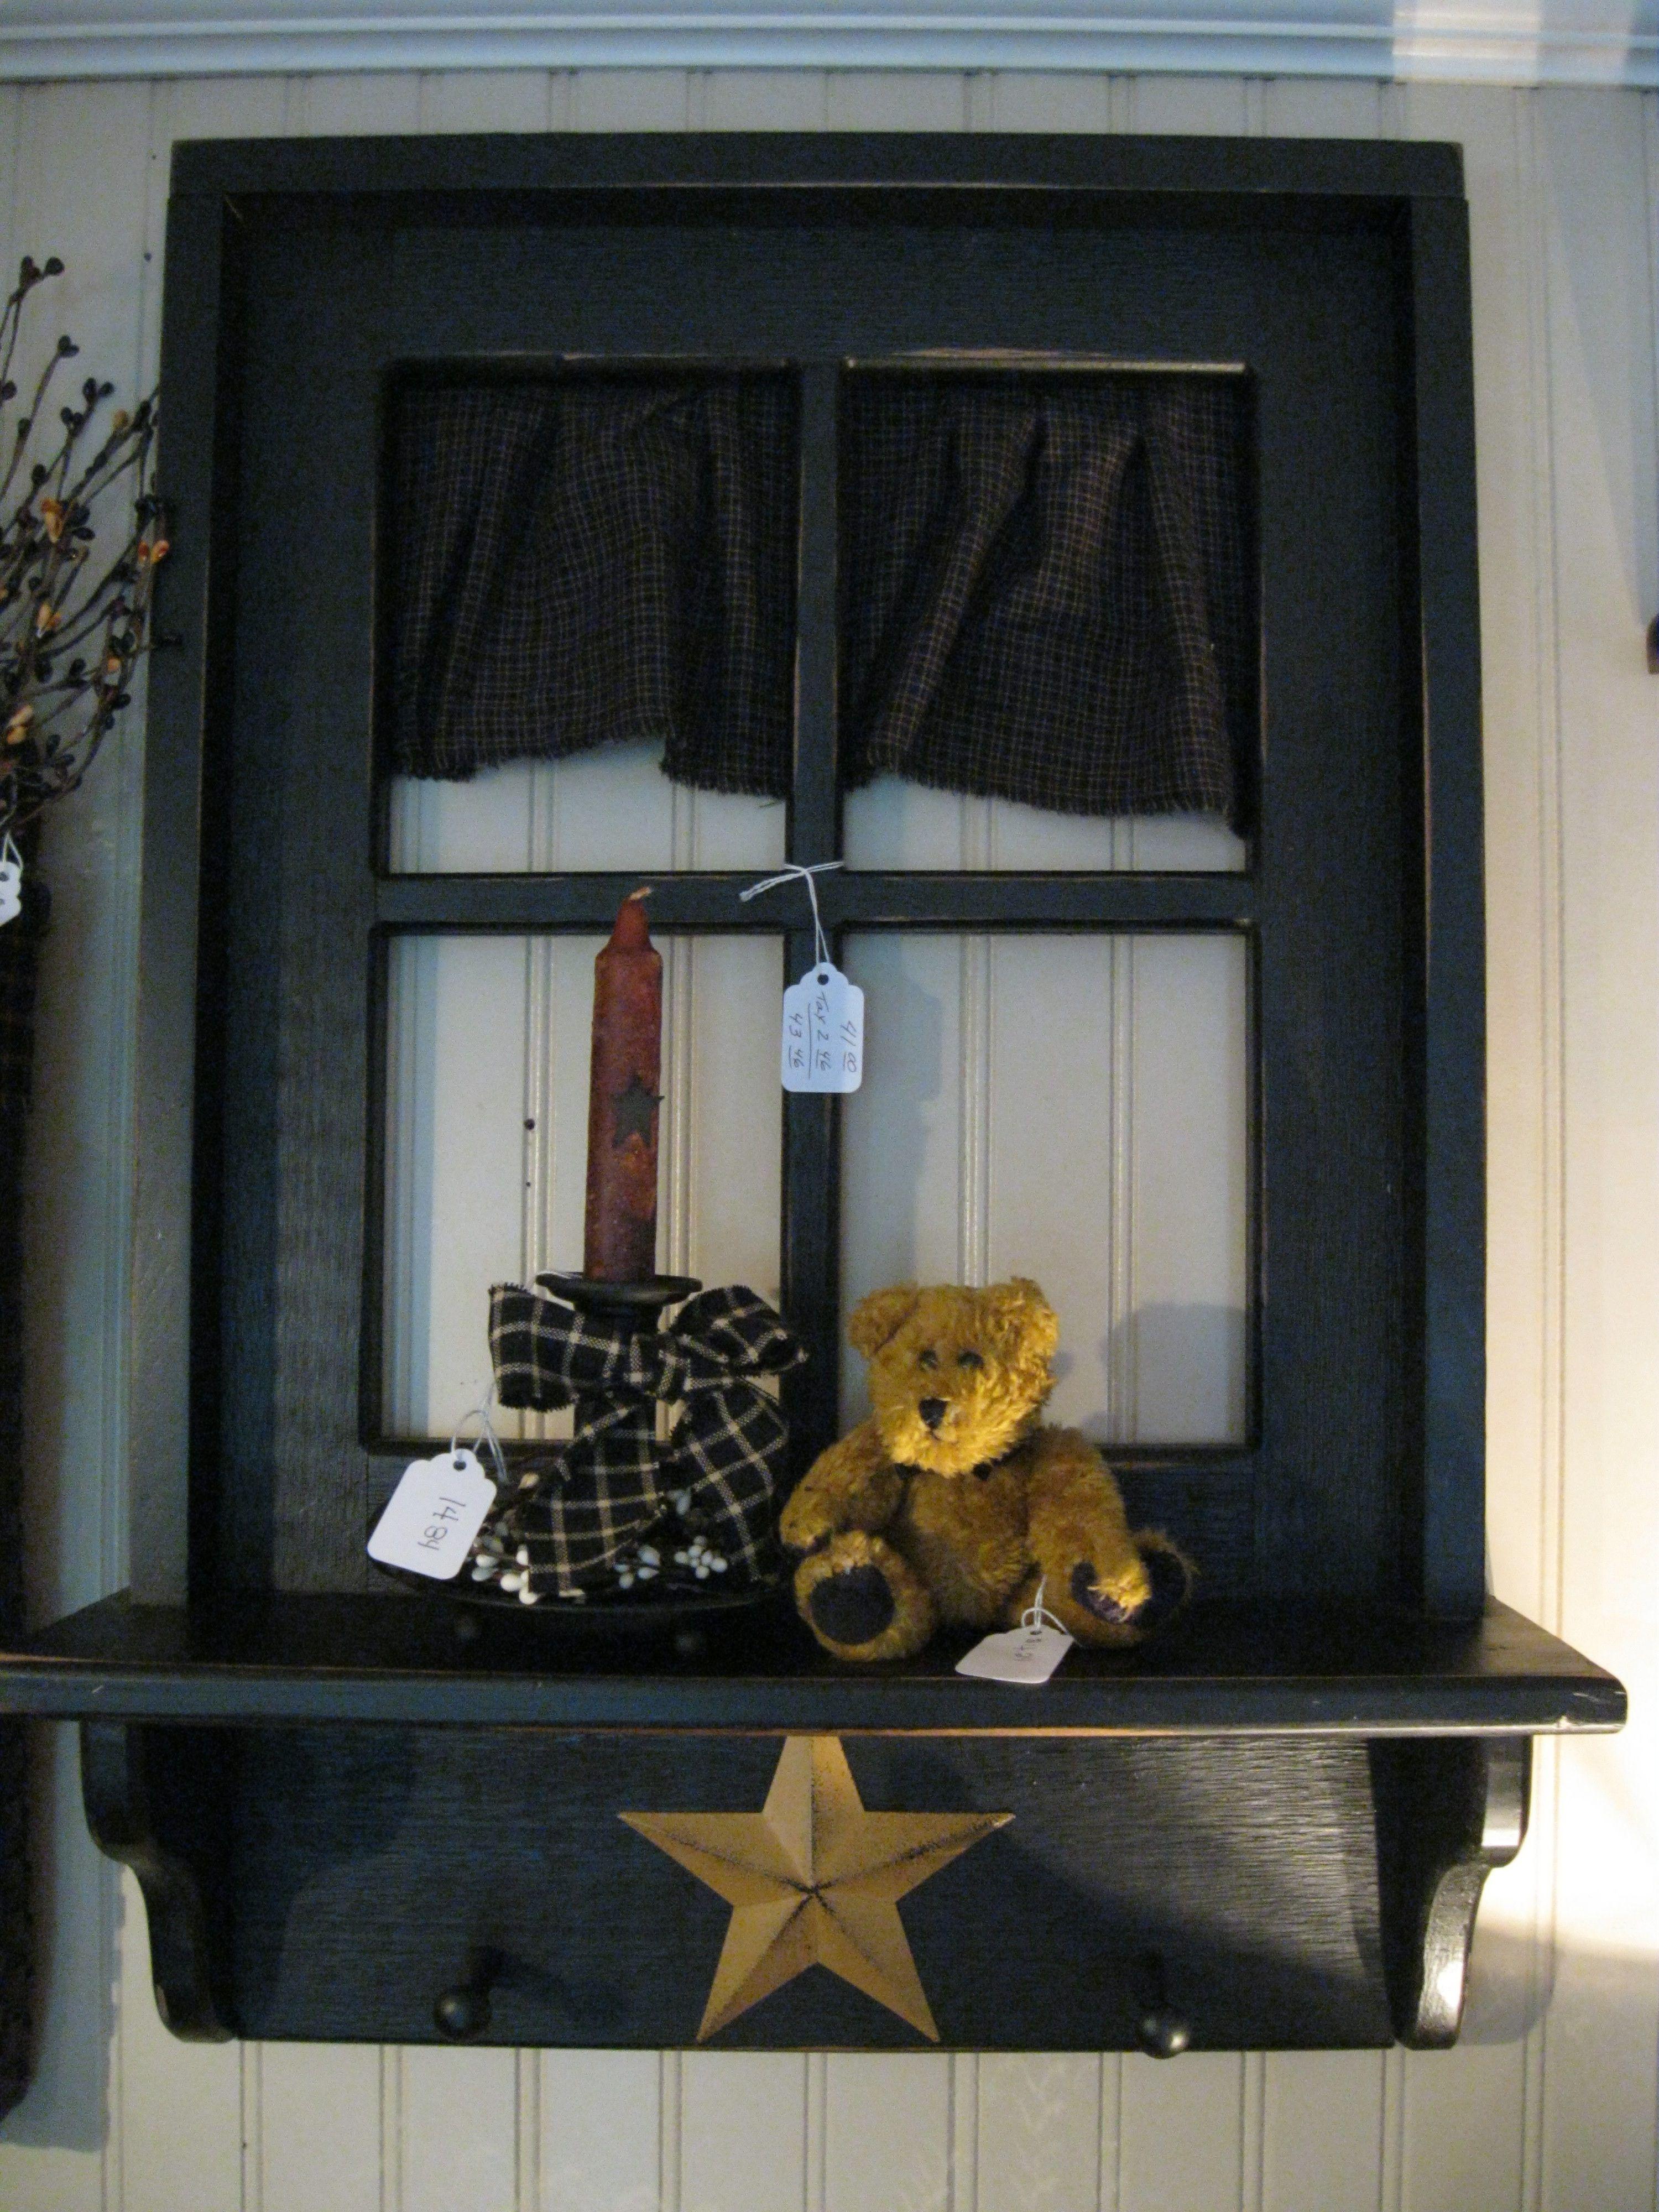 PRIMITIVE COUNTRY DECOR WINDOW PANE WITH BOX SHELFSITTER ...  Primitive Window Frame Decor